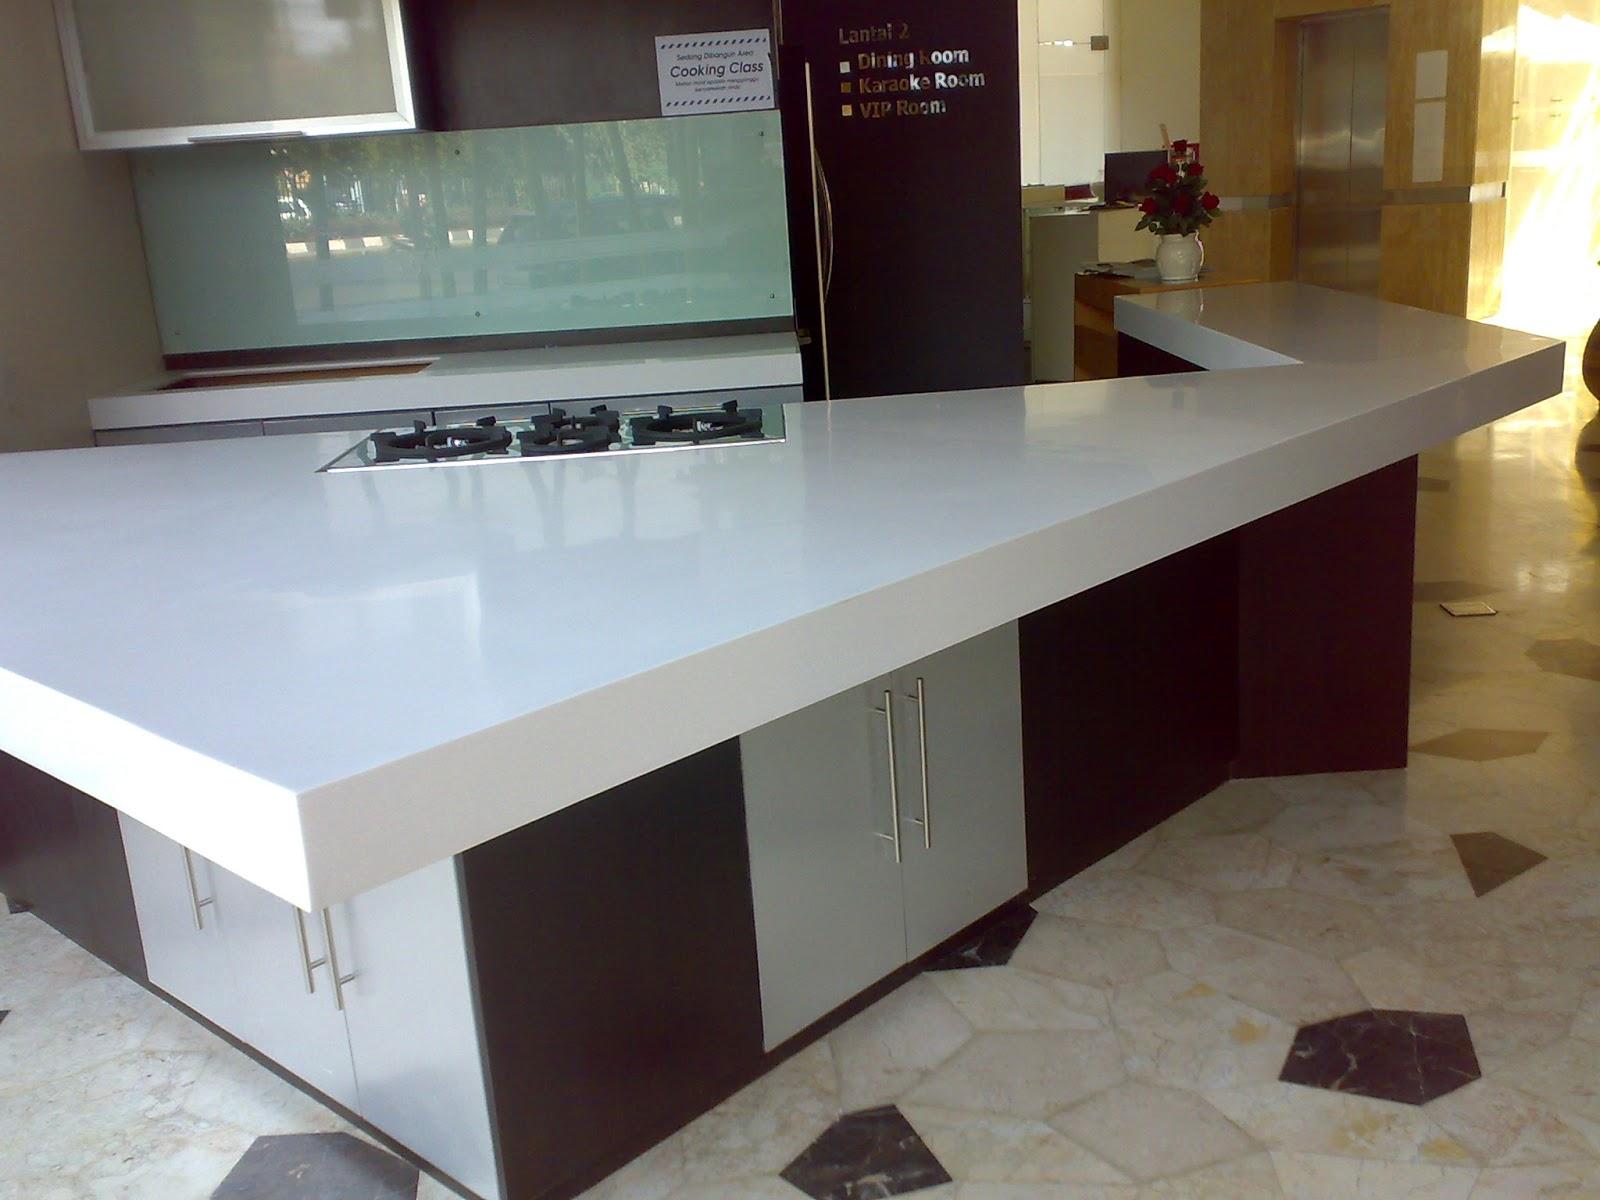 Memilih Top Table Kitchen Set   Kompasiana.com